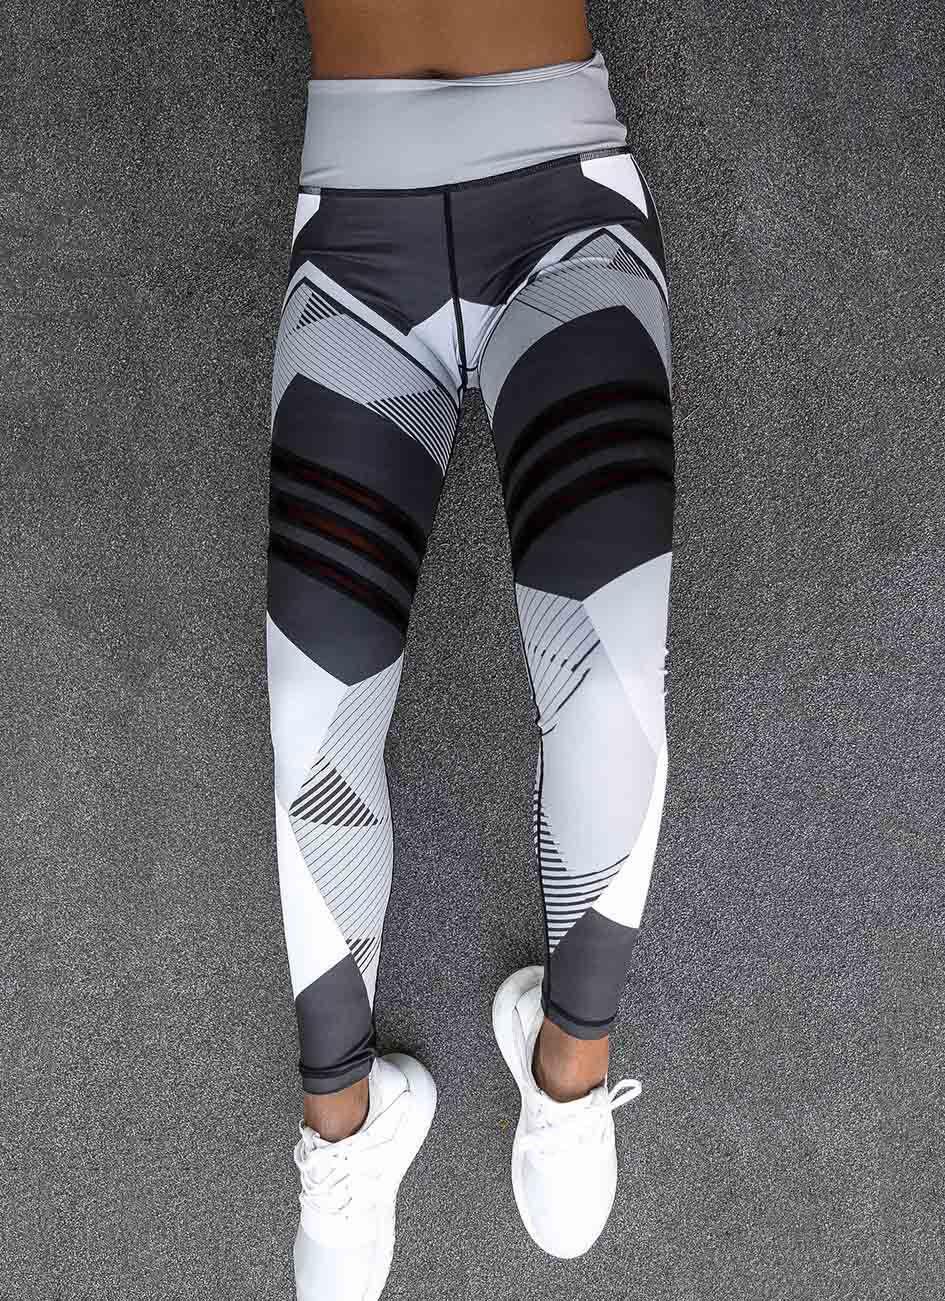 2017 Sale Women Leggings High Elastic Leggings Printing Women Fitness Legging Push Up Pants Clothing Sporting Leggins Jegging 14